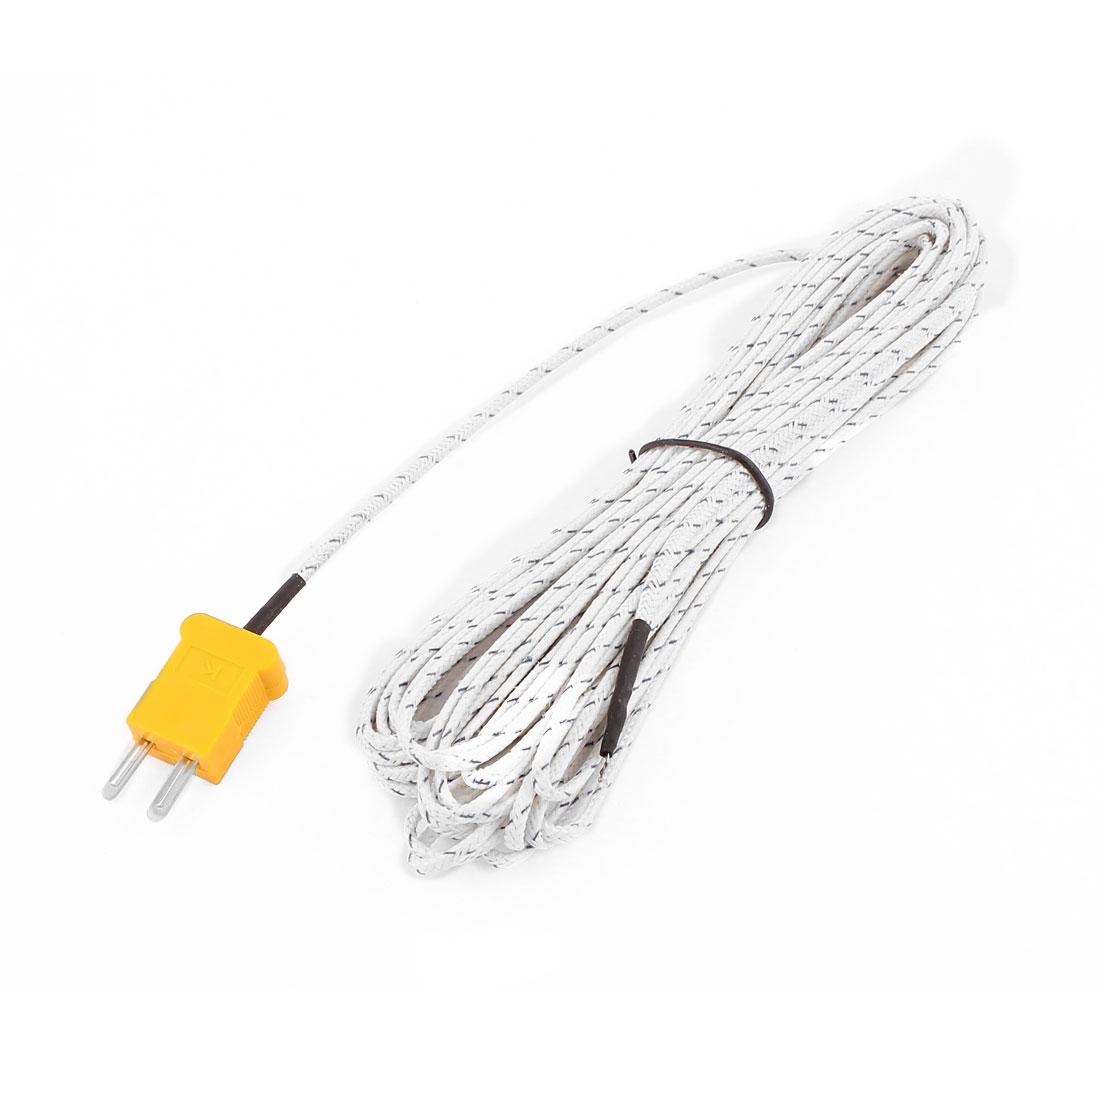 K Type Temperature Measurement Thermocouple Sensor Probe Cable -50 to +204C 10M